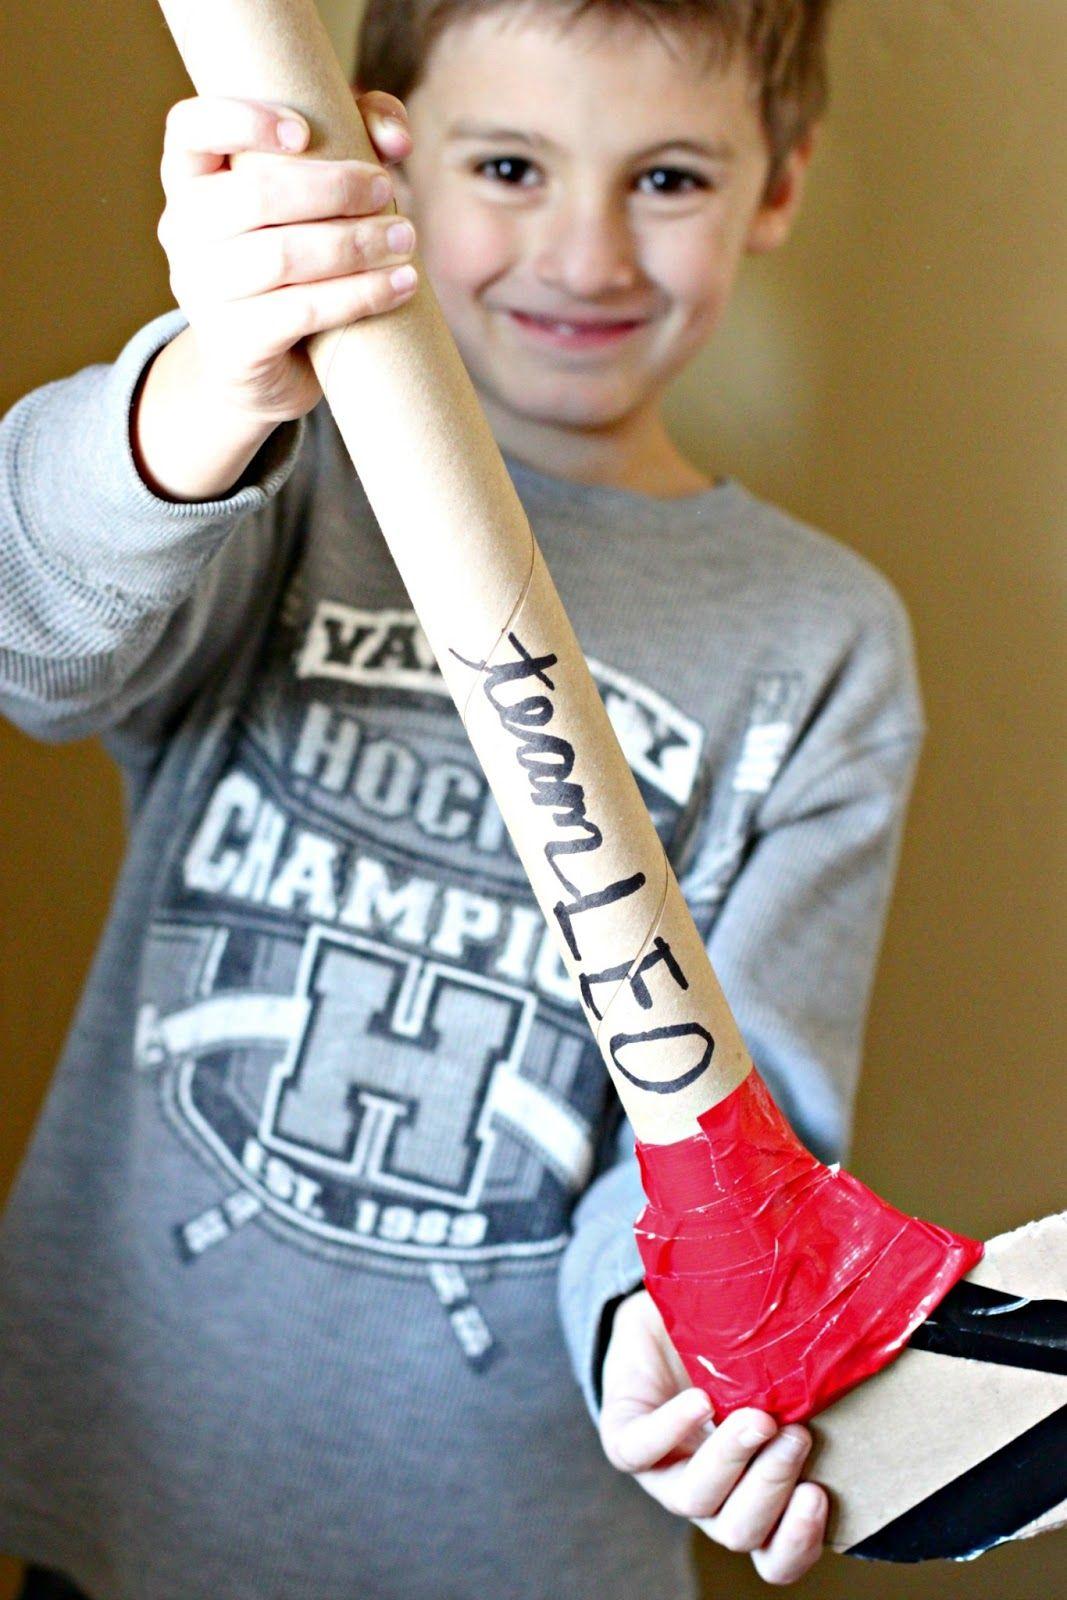 Diy Cardboard Hockey Sticks For Indoor Floor Play Ideas Simple Circuits Kids Http Wwwmakingboysmencom 2013 04